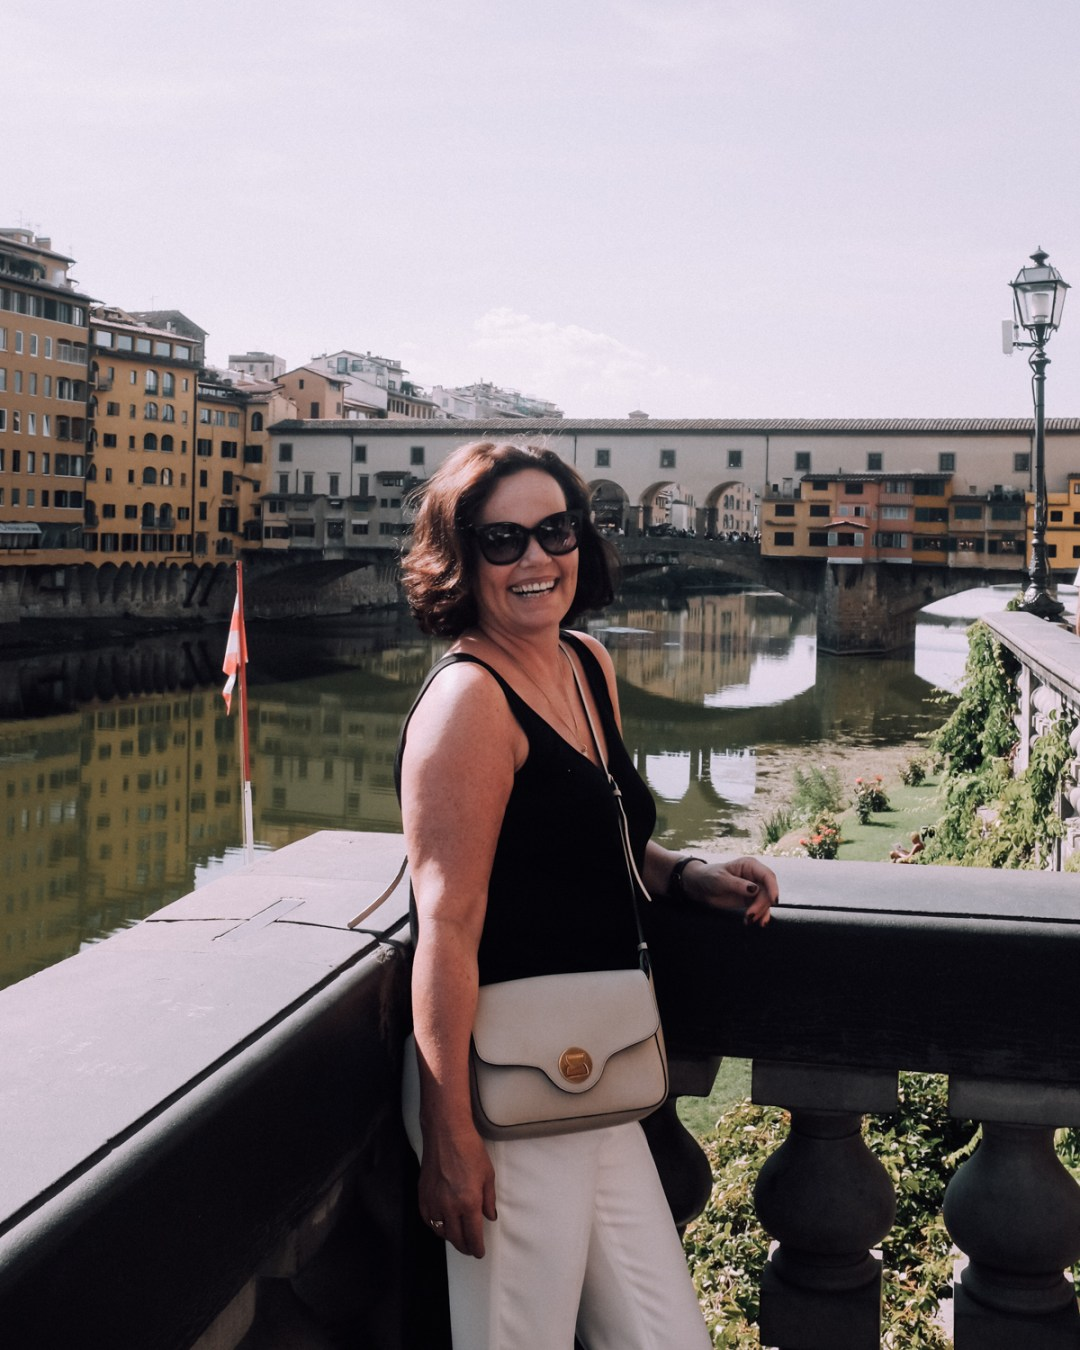 inastil, Ü50Blogger, Reiseblogger, Toskana, Villa, Florenz, Siena, Certaldo, Lifestyle, Italienreise, Italienliebe, Cabriotour-3